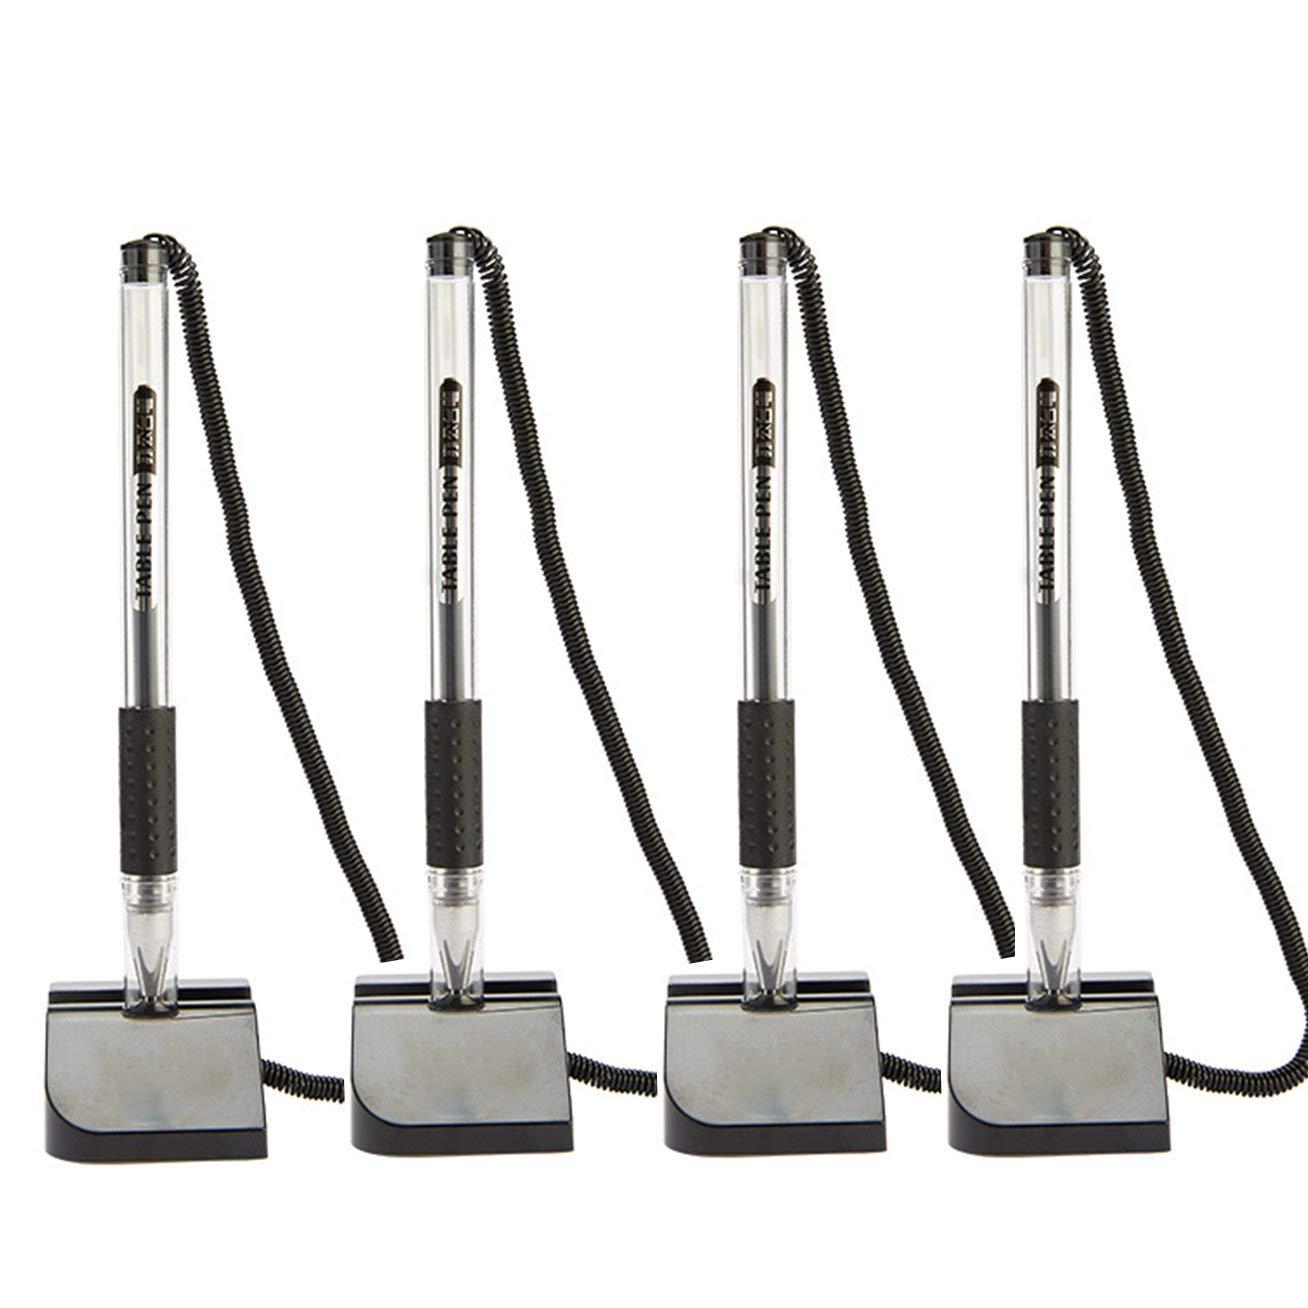 BK Barrel//Ink PM Company 05057 Counter Pen Square Adhesive Base//Chain